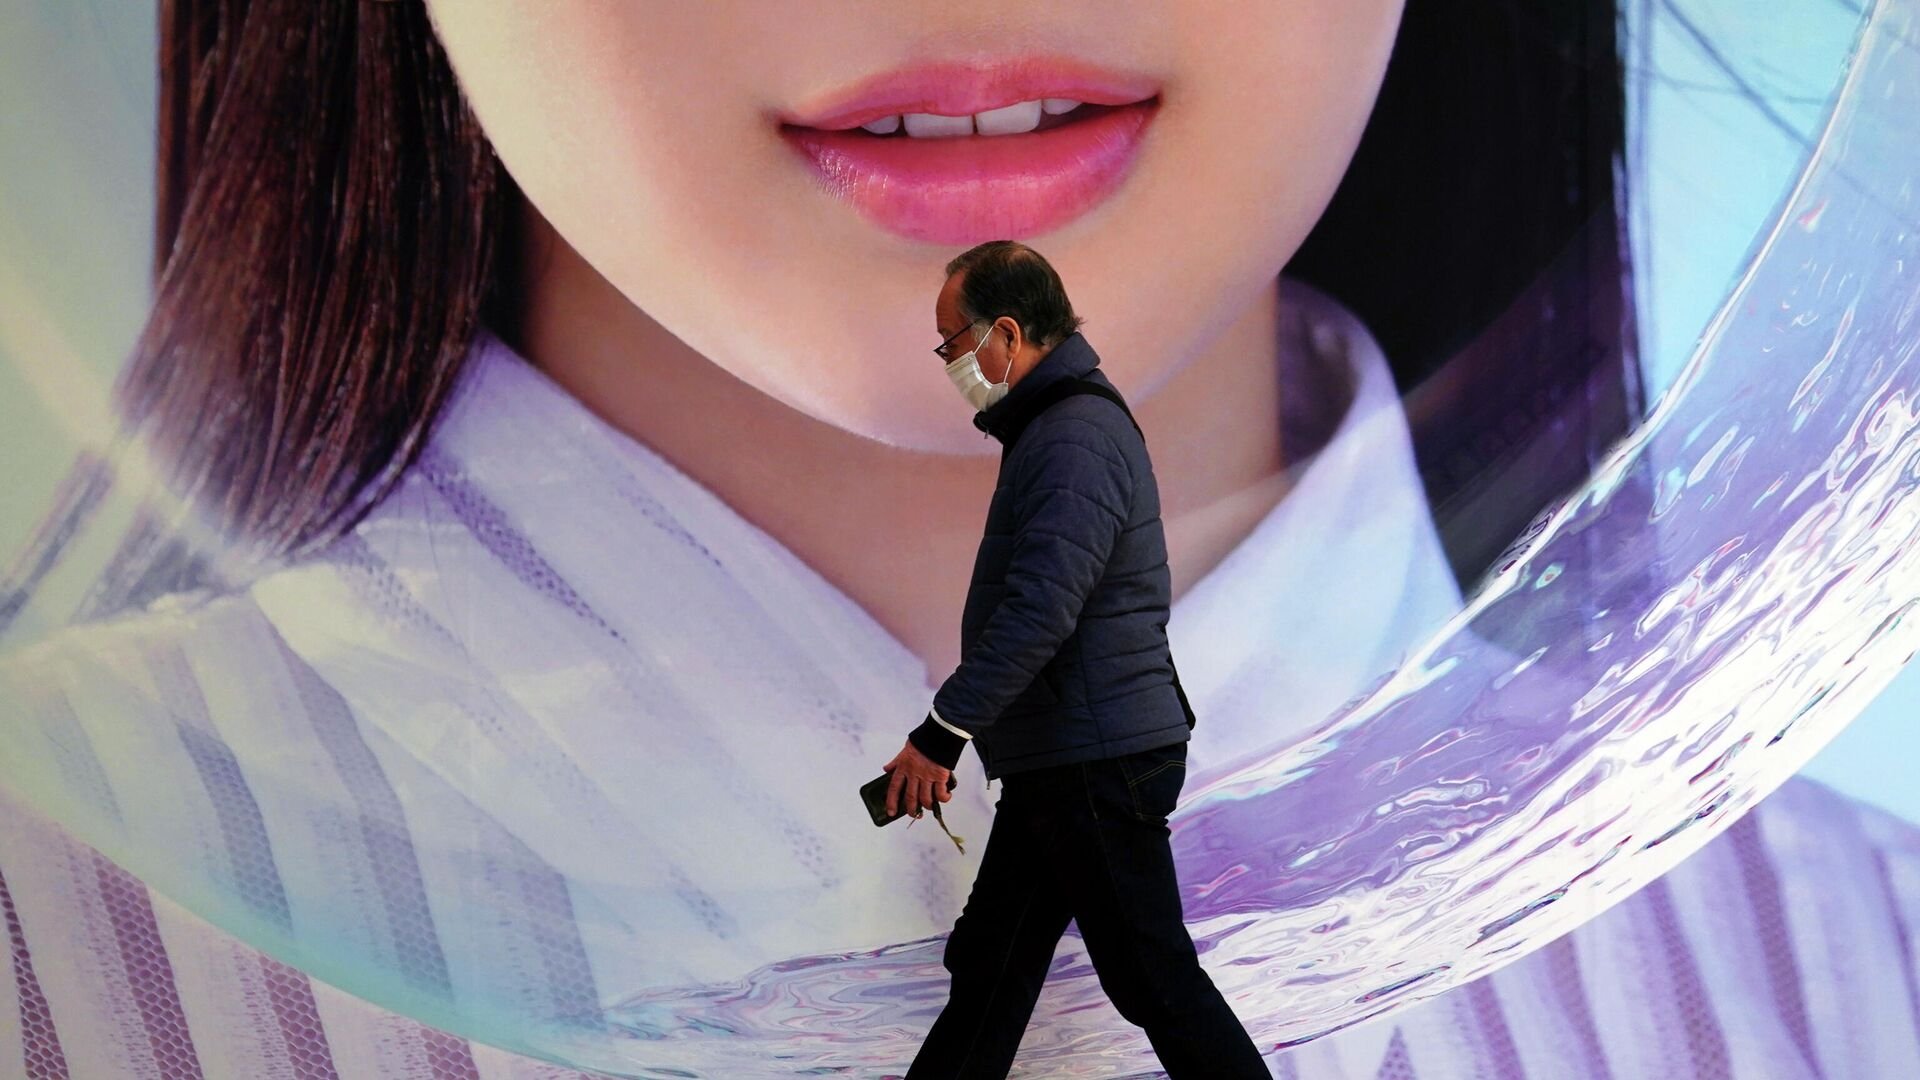 Мужчина в защитной маске проходит мимо рекламного щита в Токио - РИА Новости, 1920, 22.02.2021